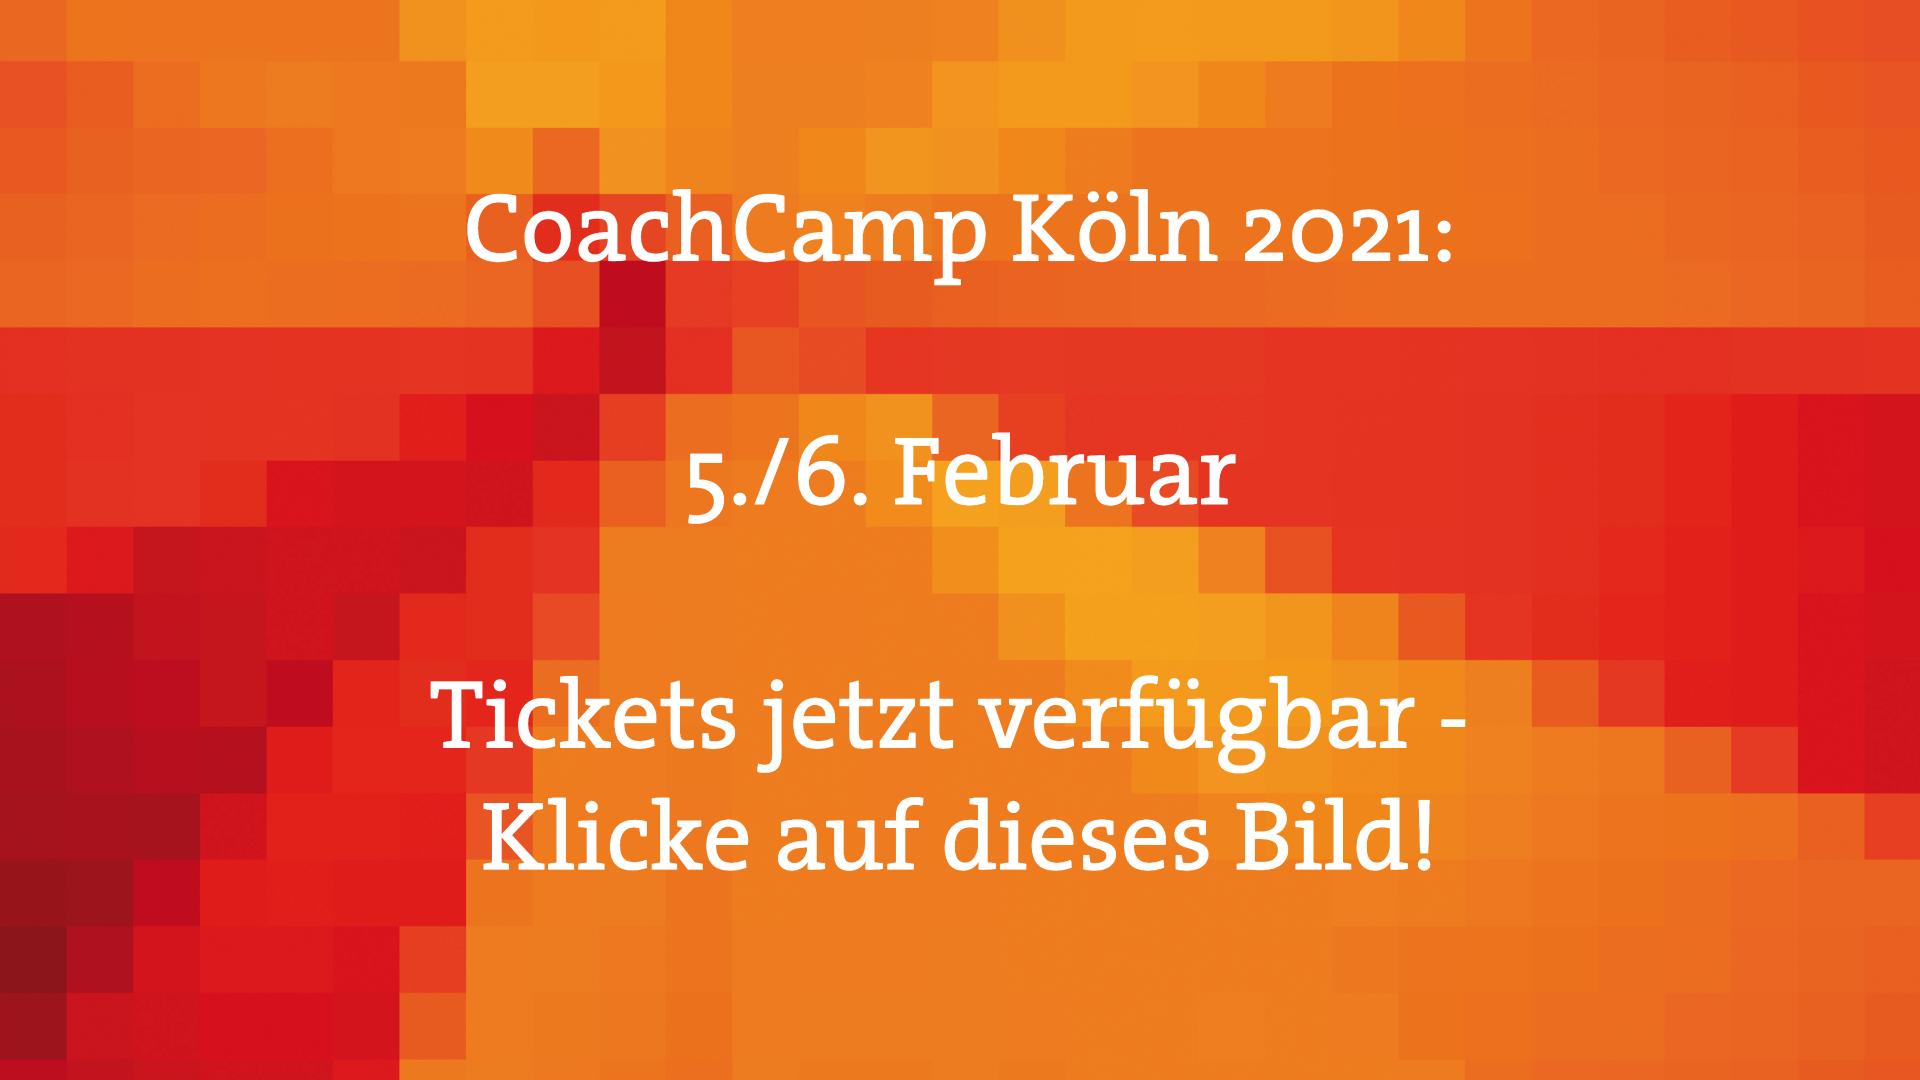 CoachCamp Köln 2021